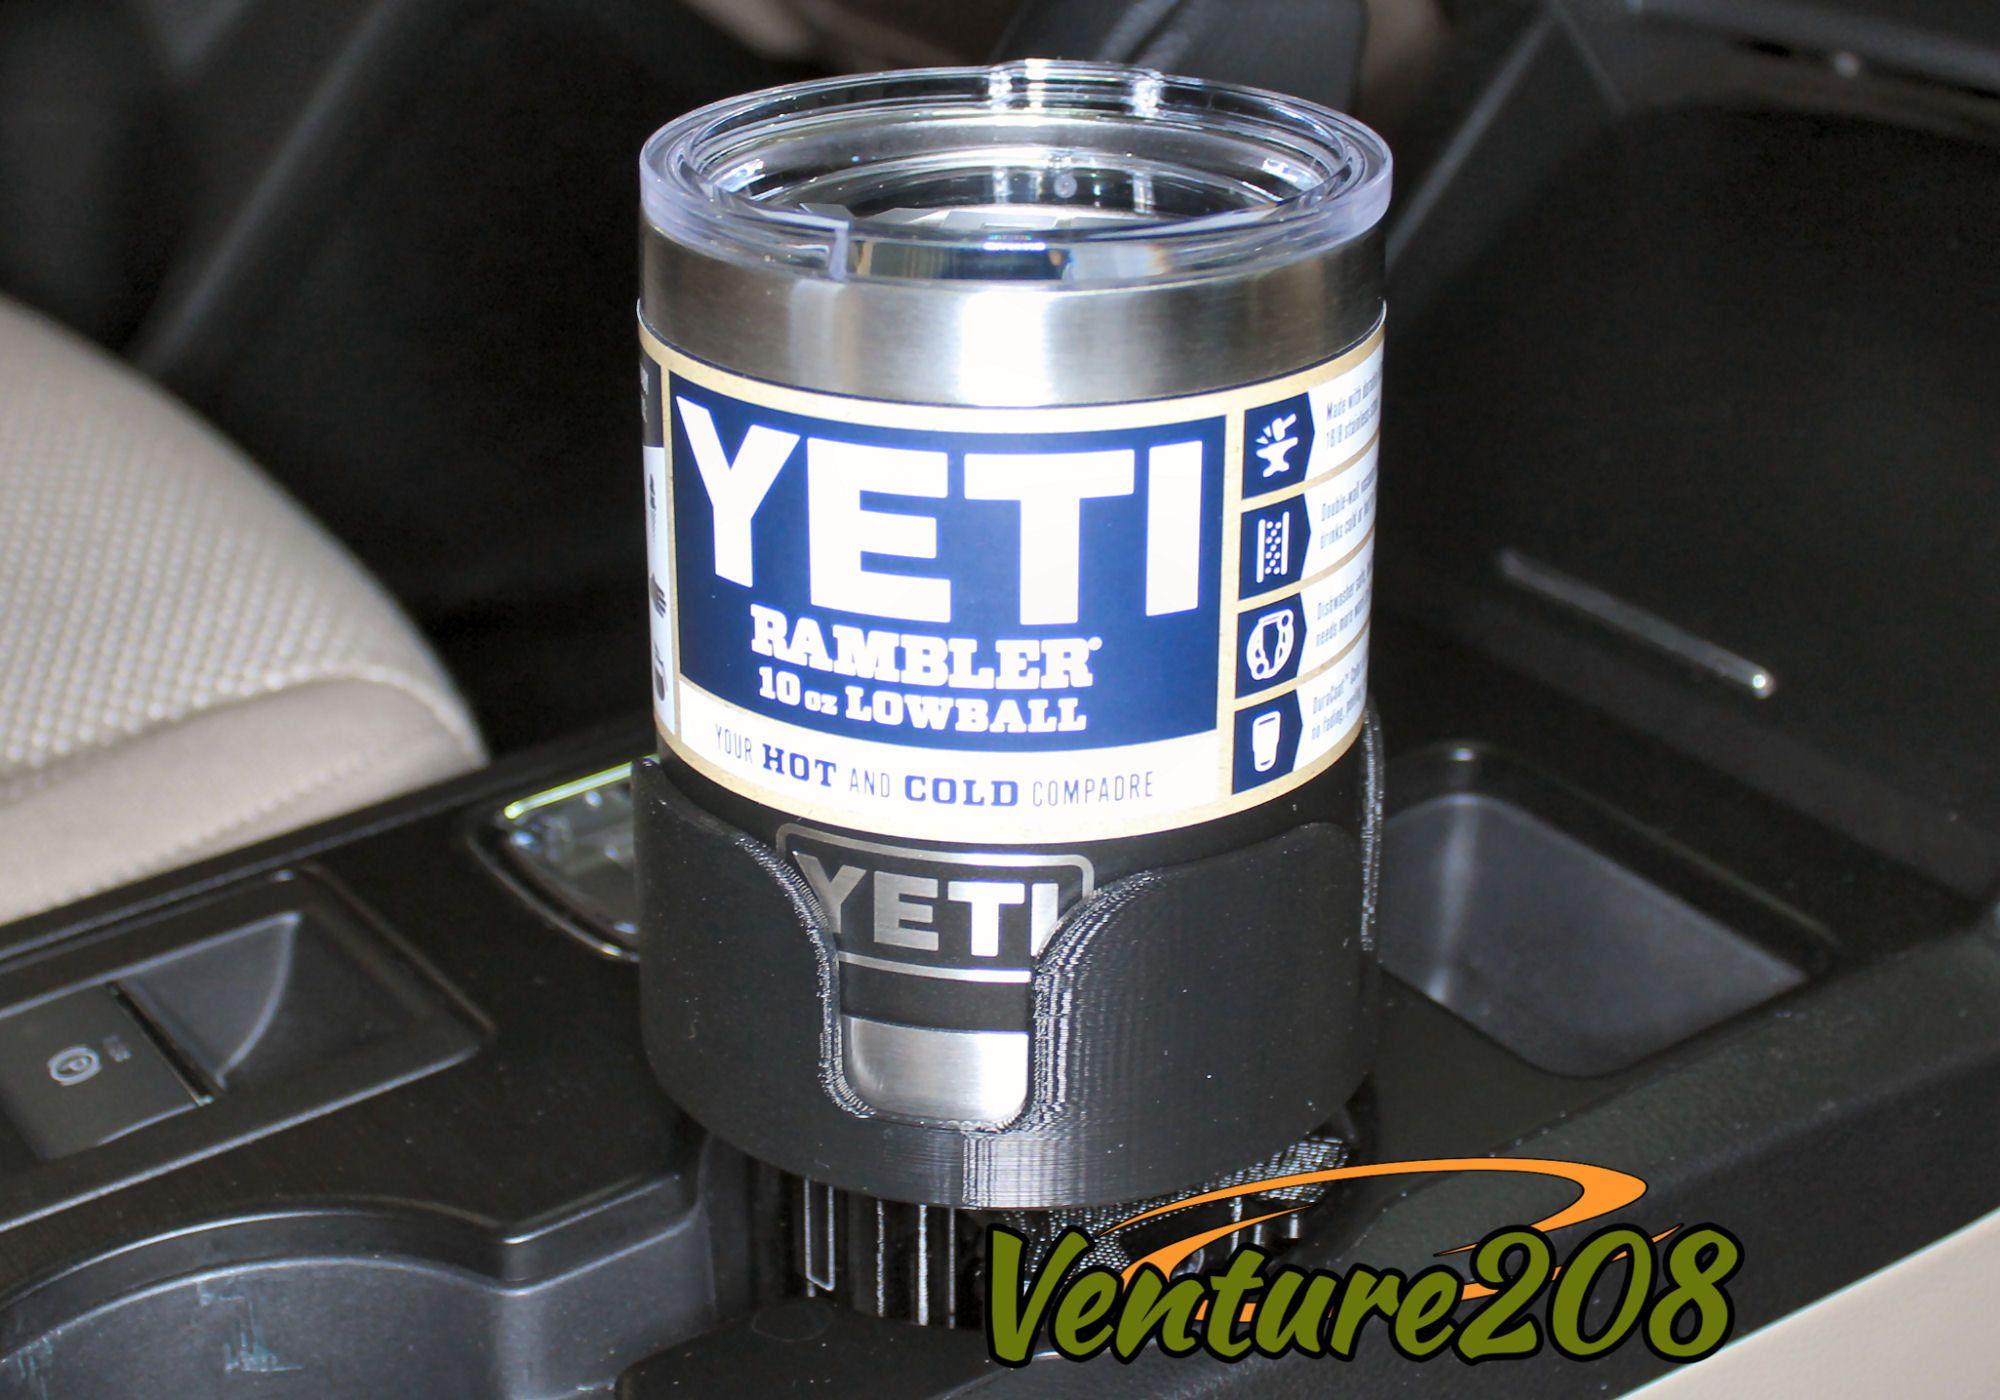 Mug Buddy Cup Holder Adapter System For Yeti Rambler 10 Oz Etsy Yeti Rambler Cup Holder Lowball